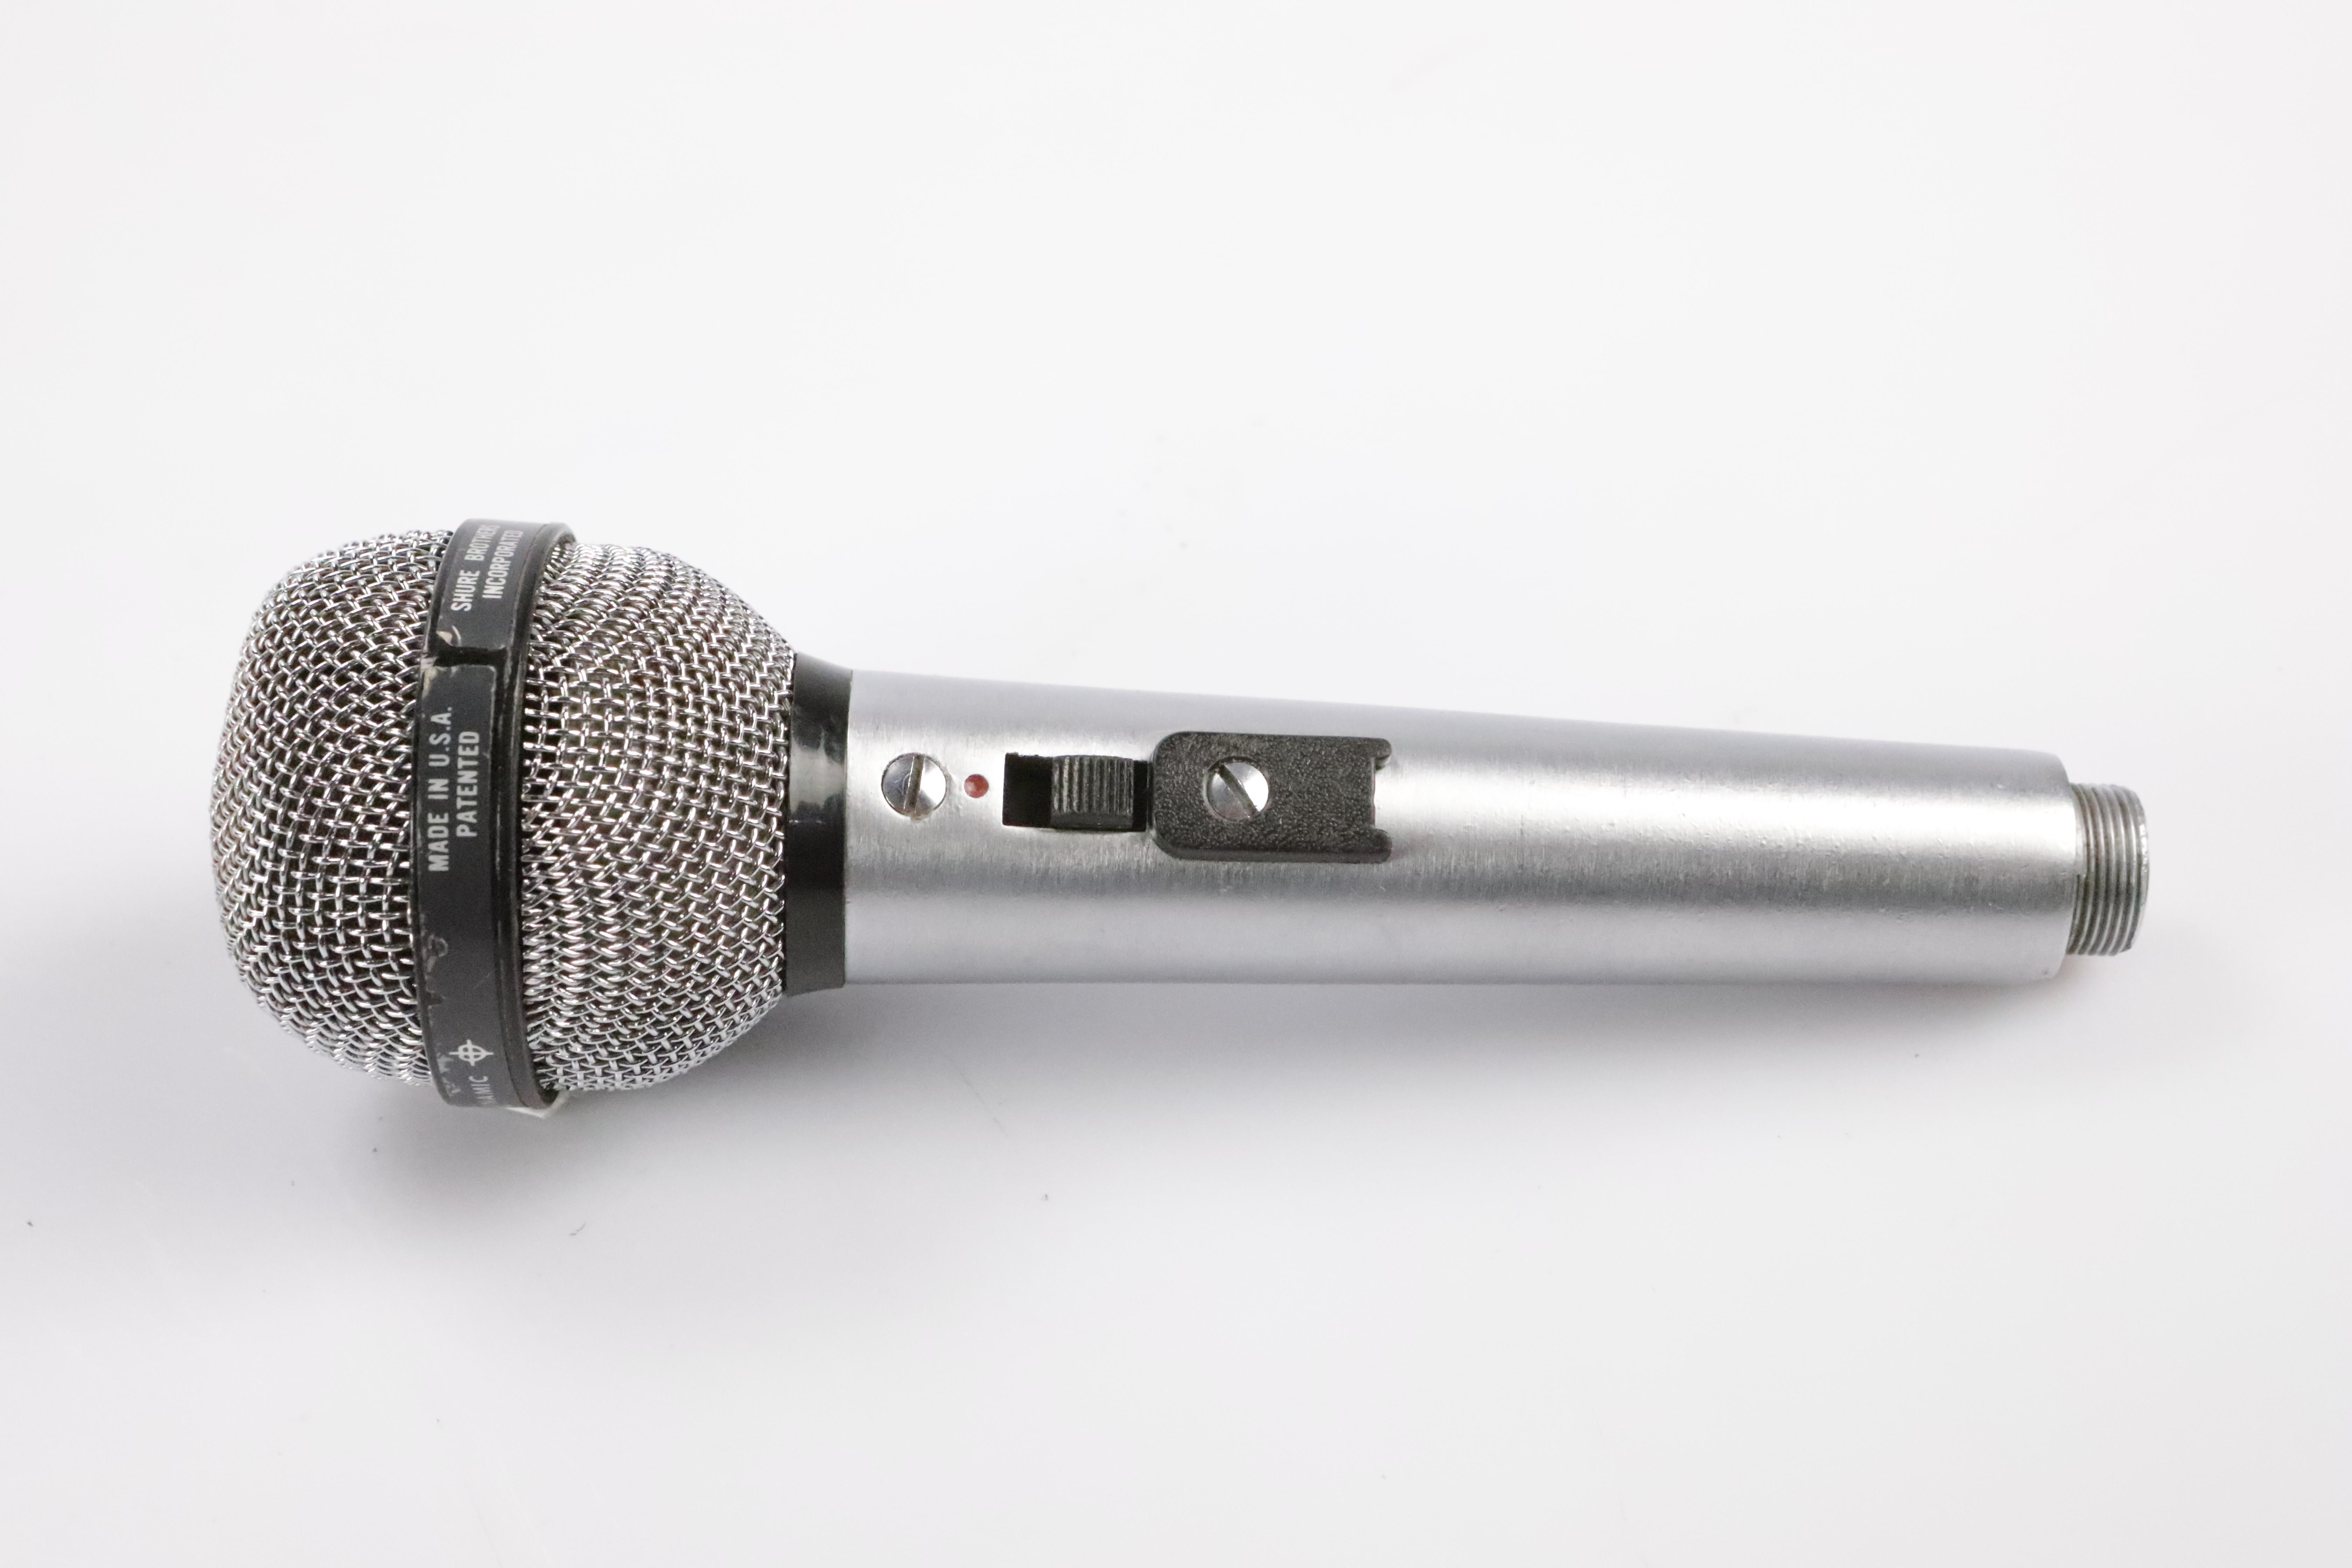 Shure USA PE 585 Unisphere A High Impedance Dynamic Microphone Mic #34659